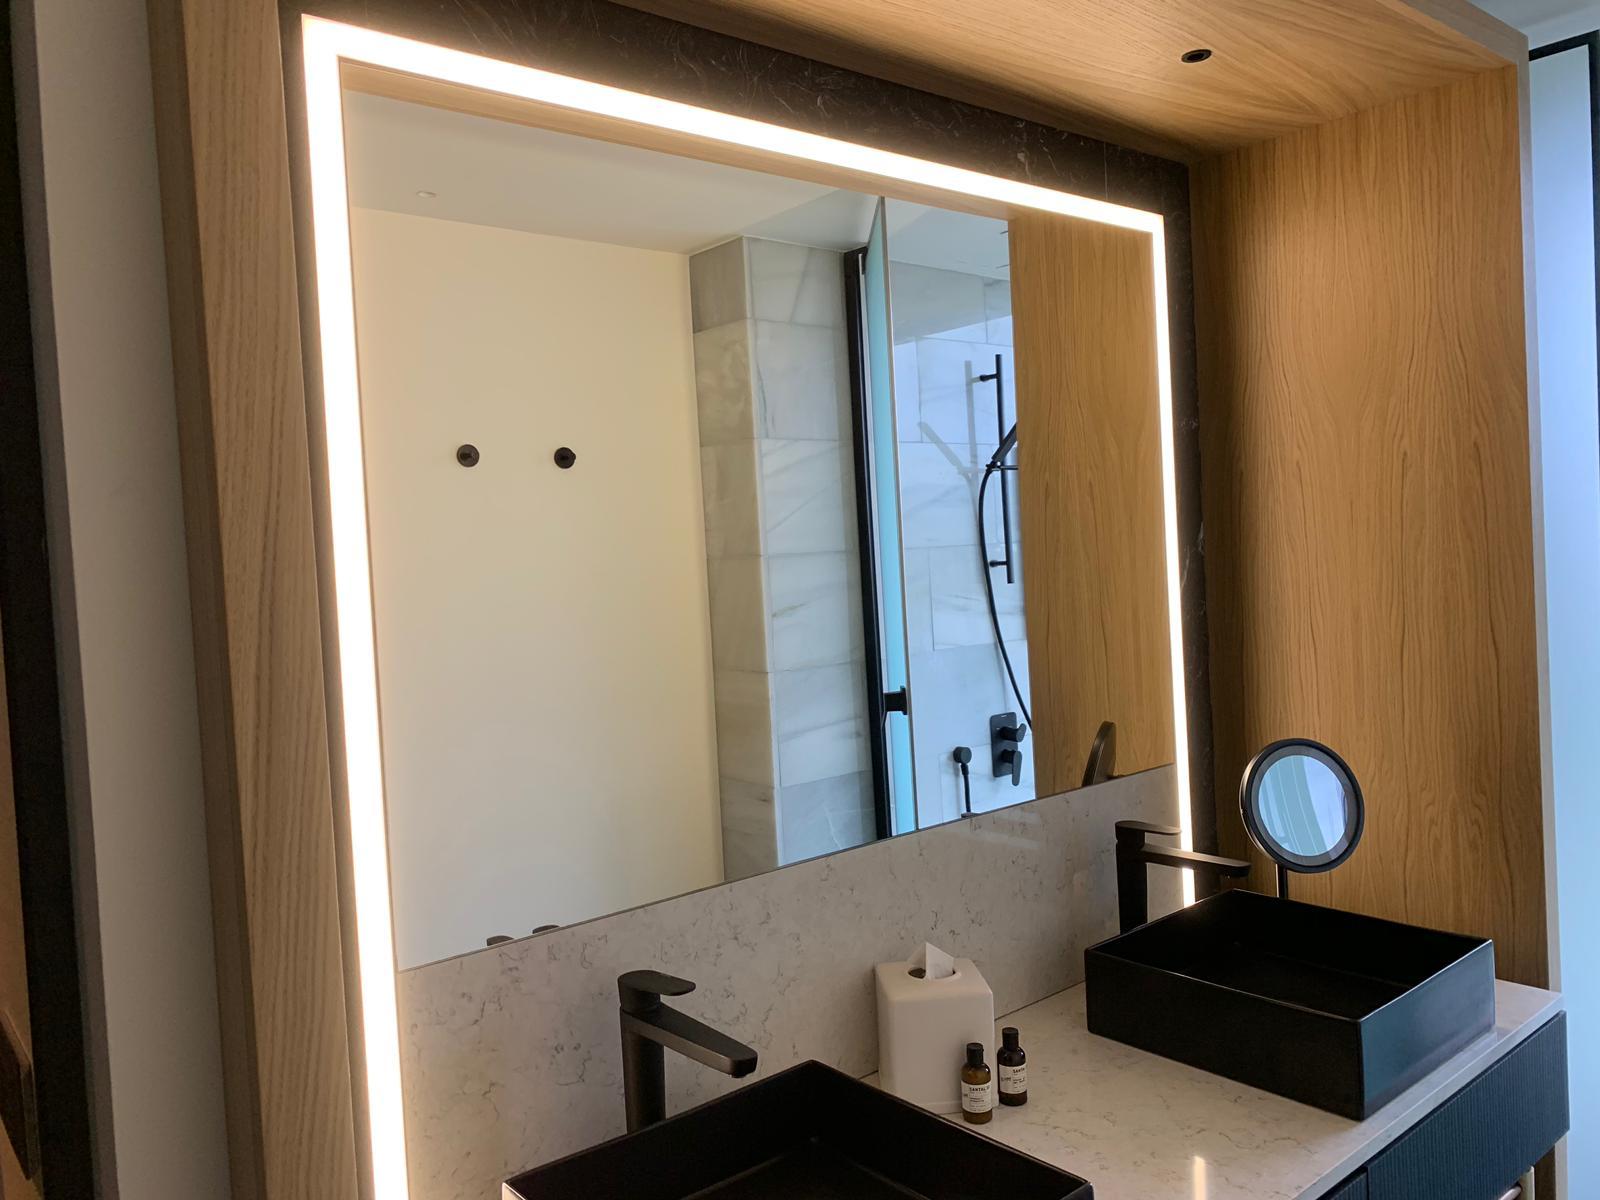 hotel-bless-ibiza-bathroom-sistemas-elener.jpg